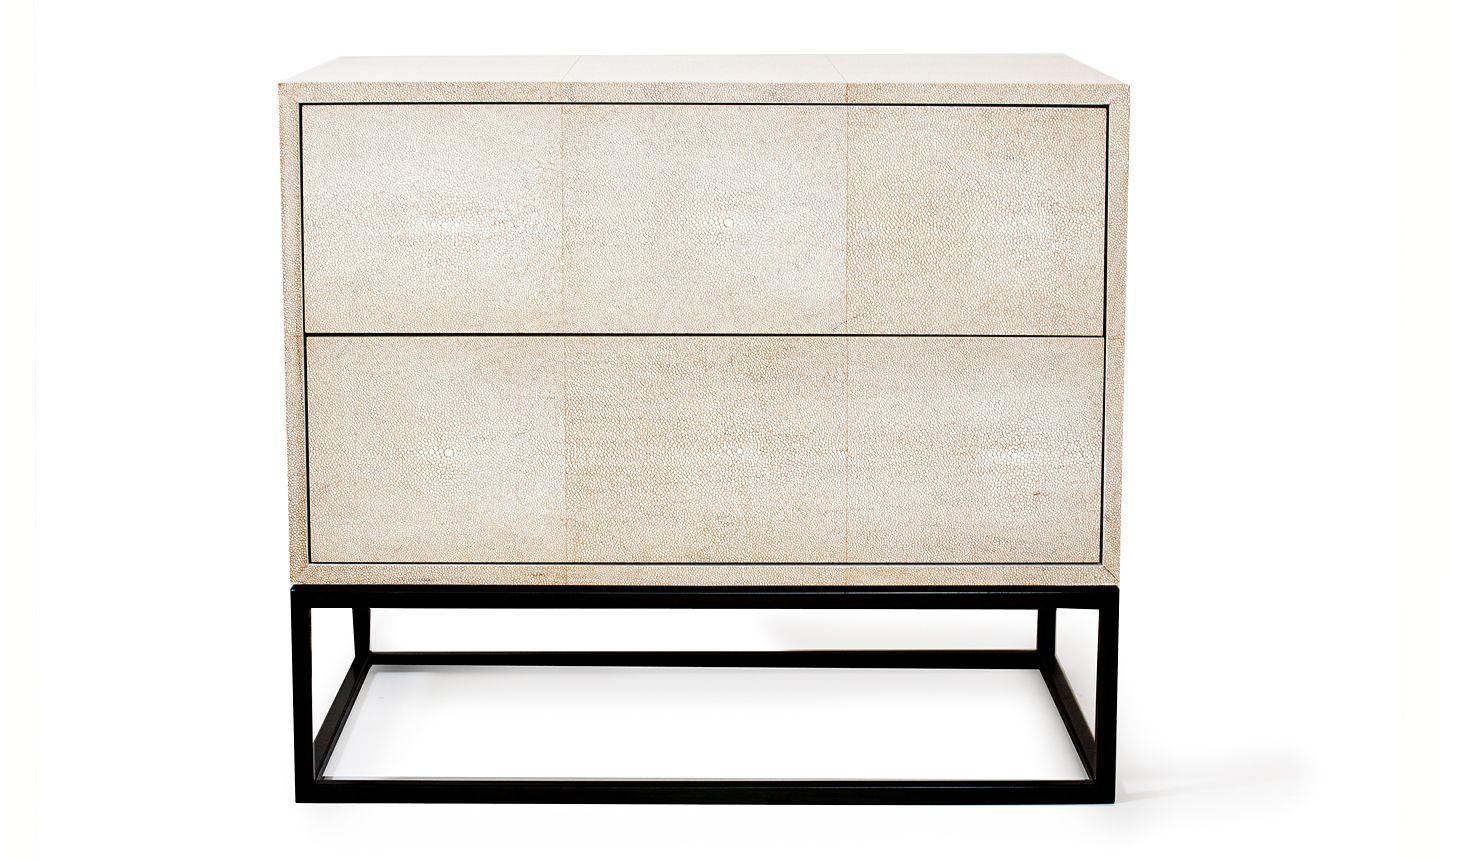 Shagreen elegant nightstand | products. | Pinterest ...